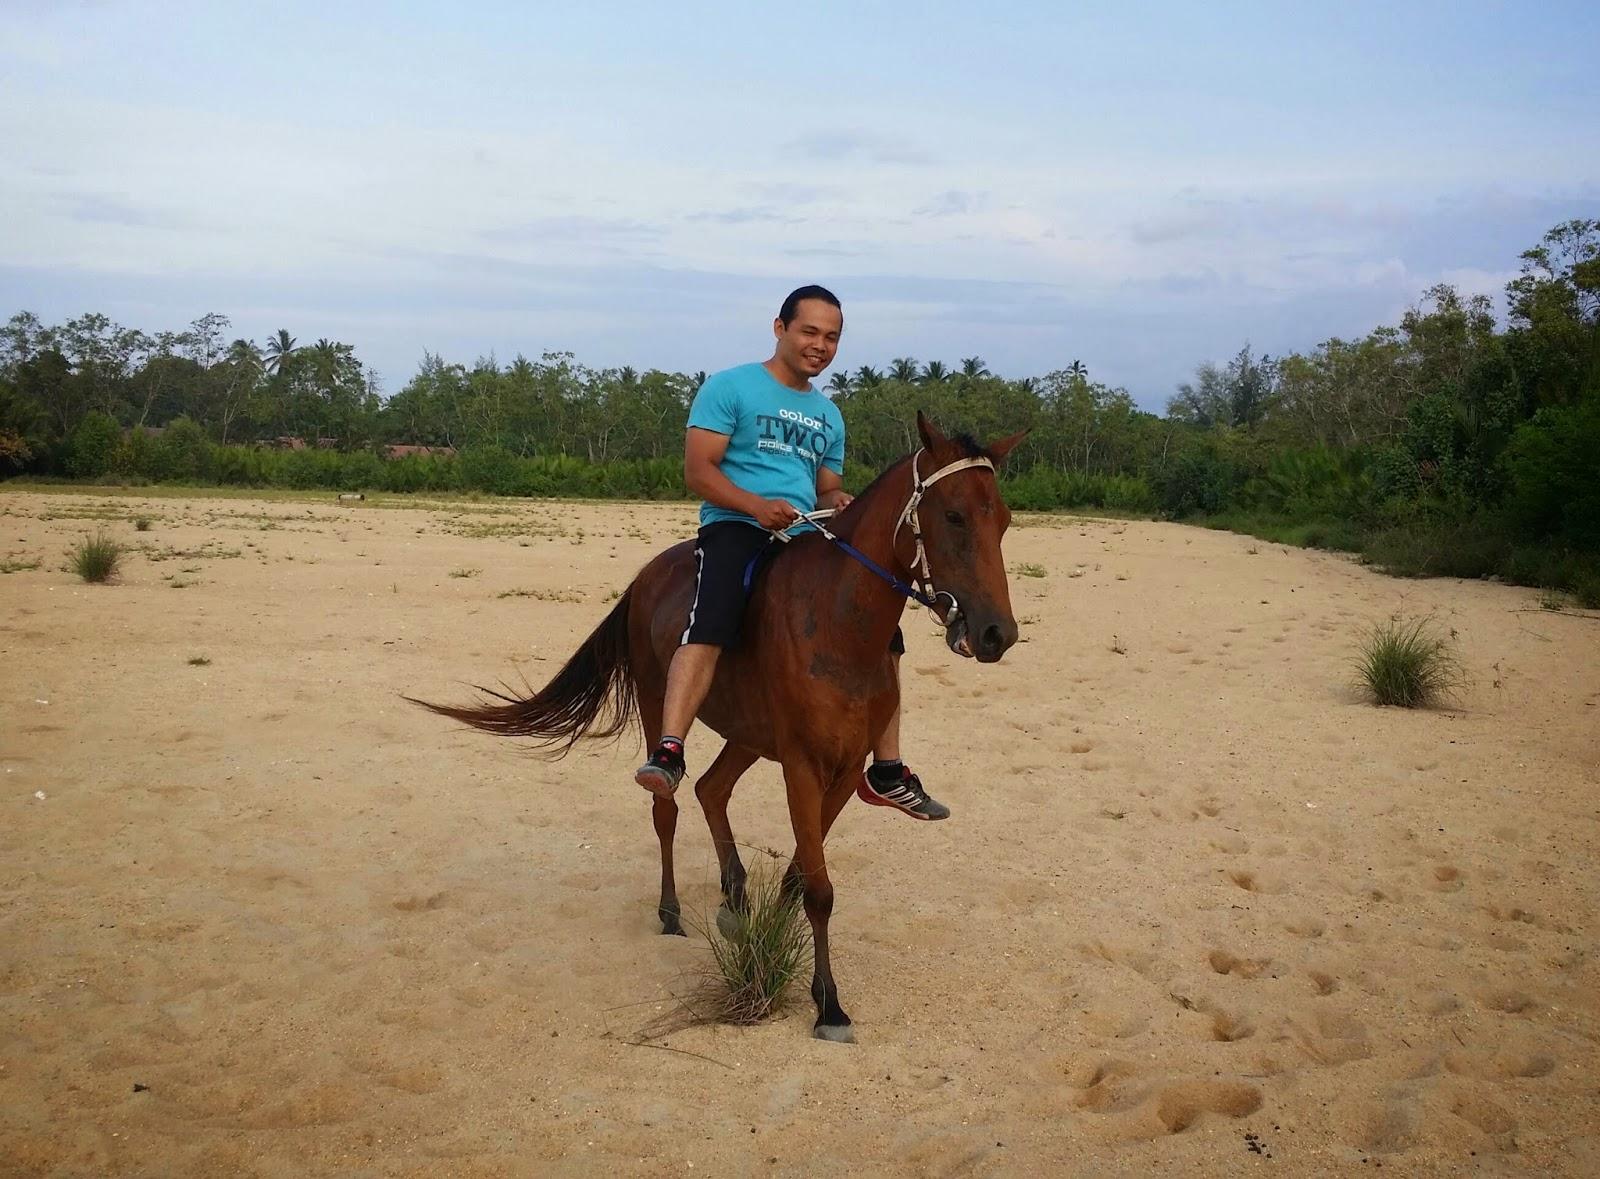 cara tunggang kuda, kereta kuda, pengalaman naik kuda, ride horse, tunggang kuda, naik kuda, jual kuda, penjual kuda, harga kuda,